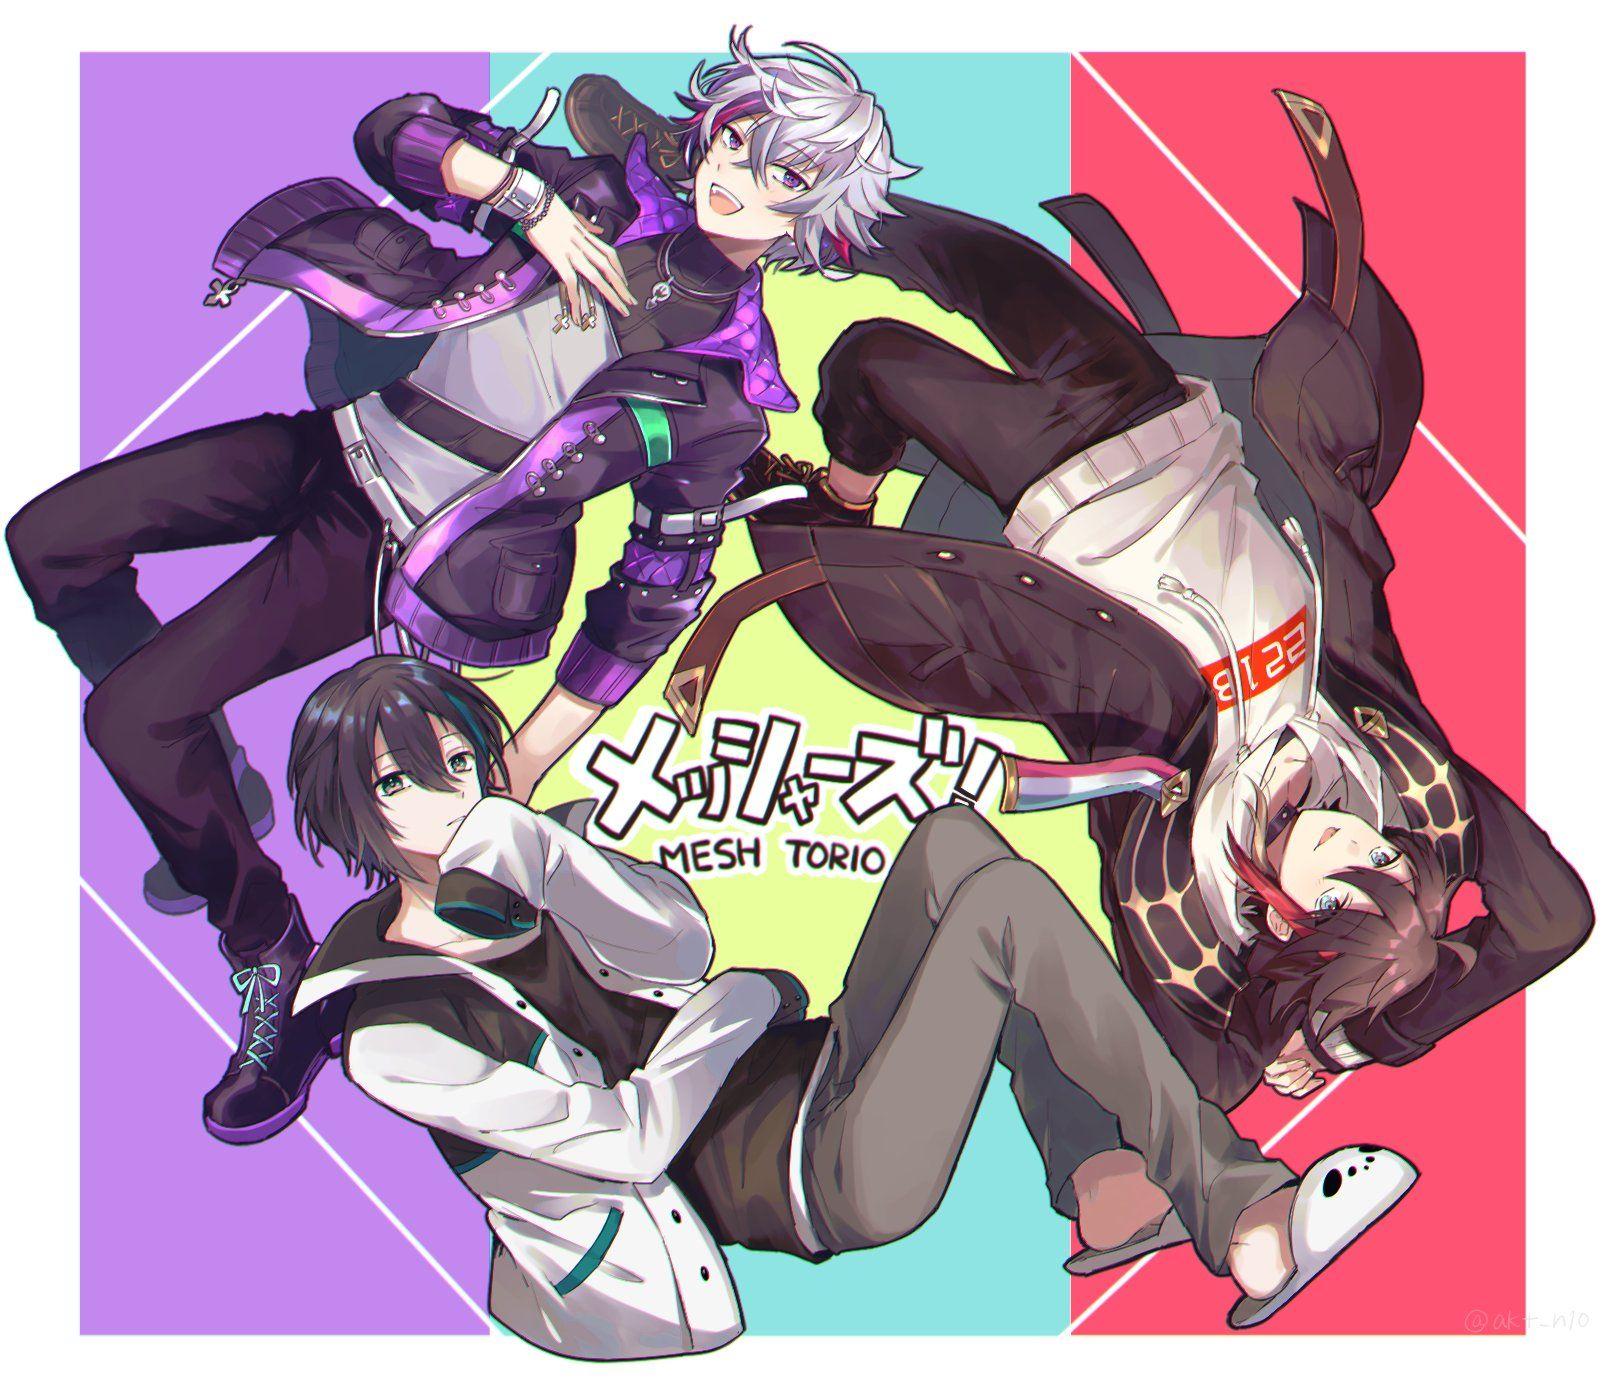 Twitter In 2020 Friend Anime Cute Anime Wallpaper Cute Anime Pics